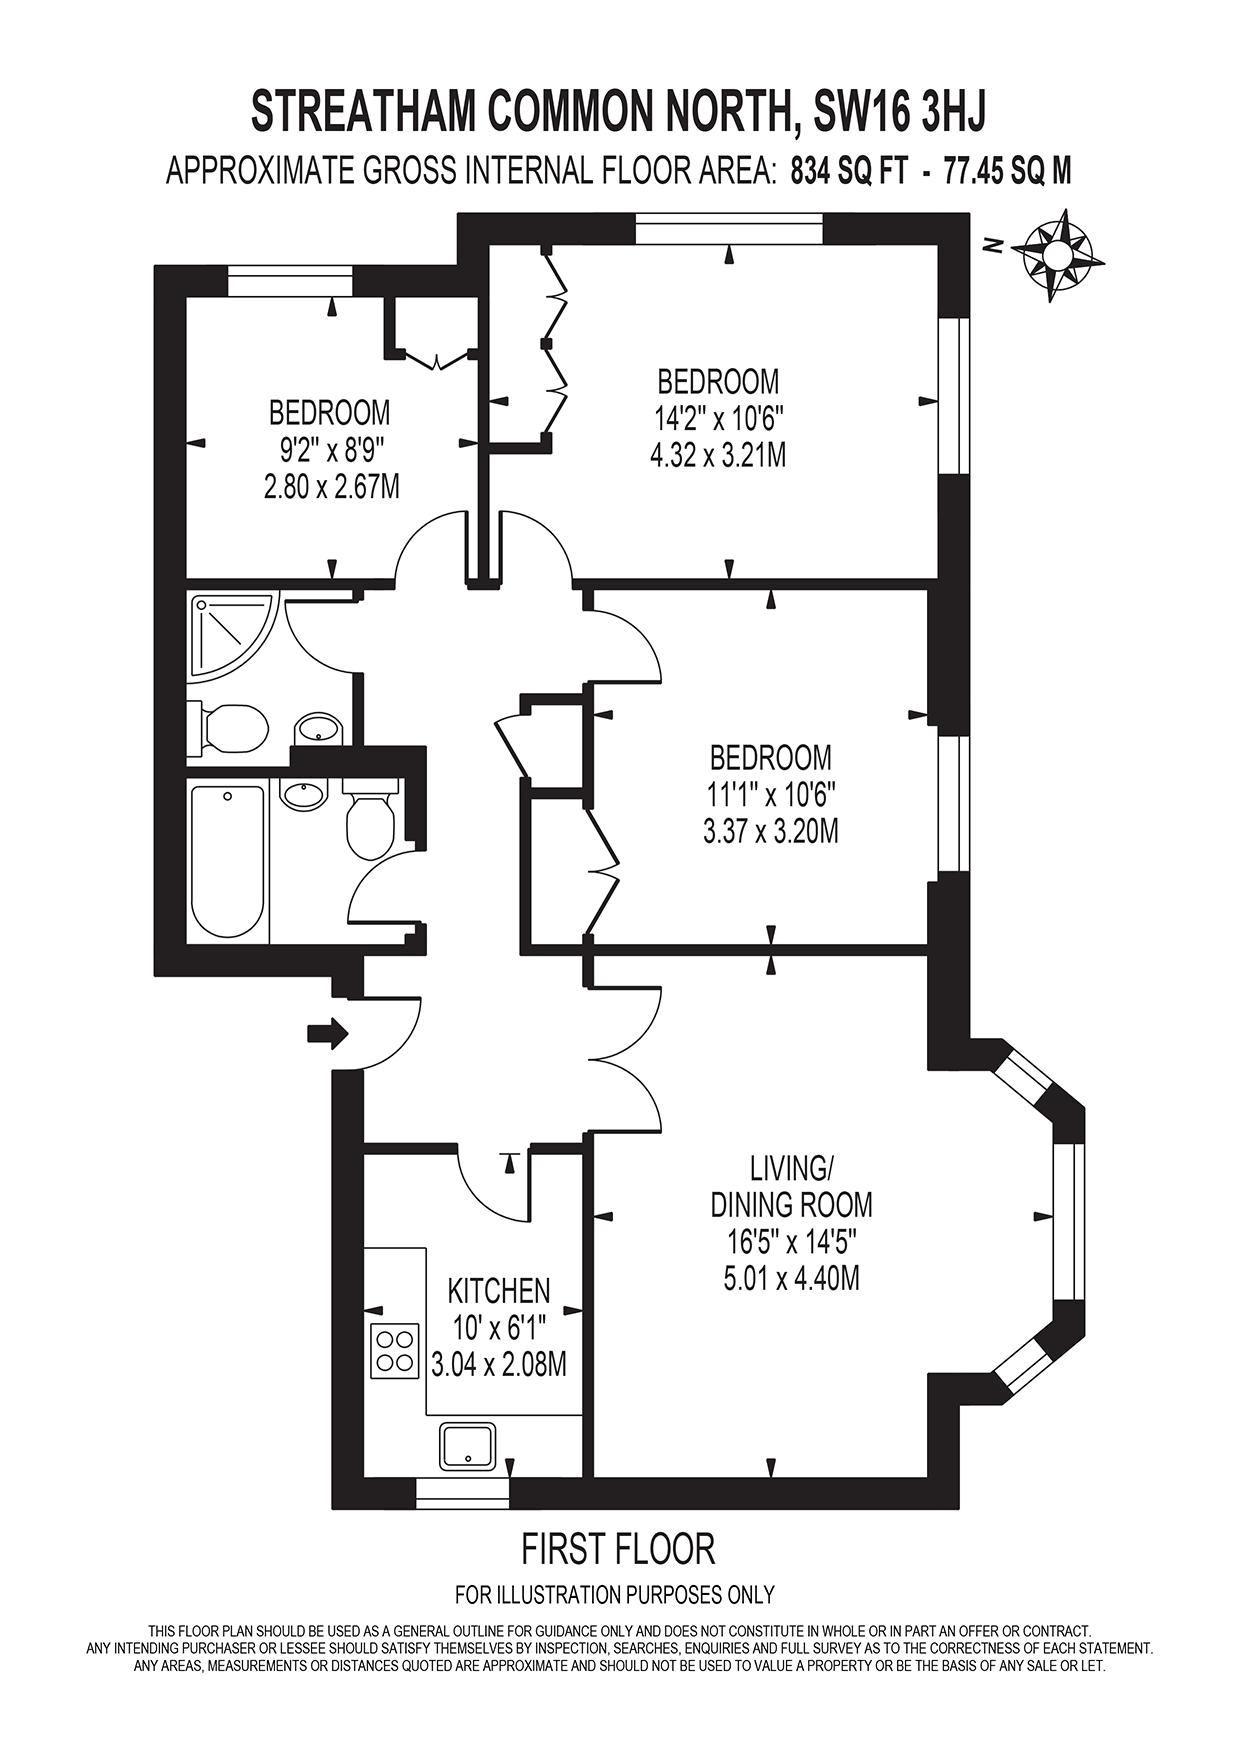 Floorplan- 11, 21 Streatham Common North